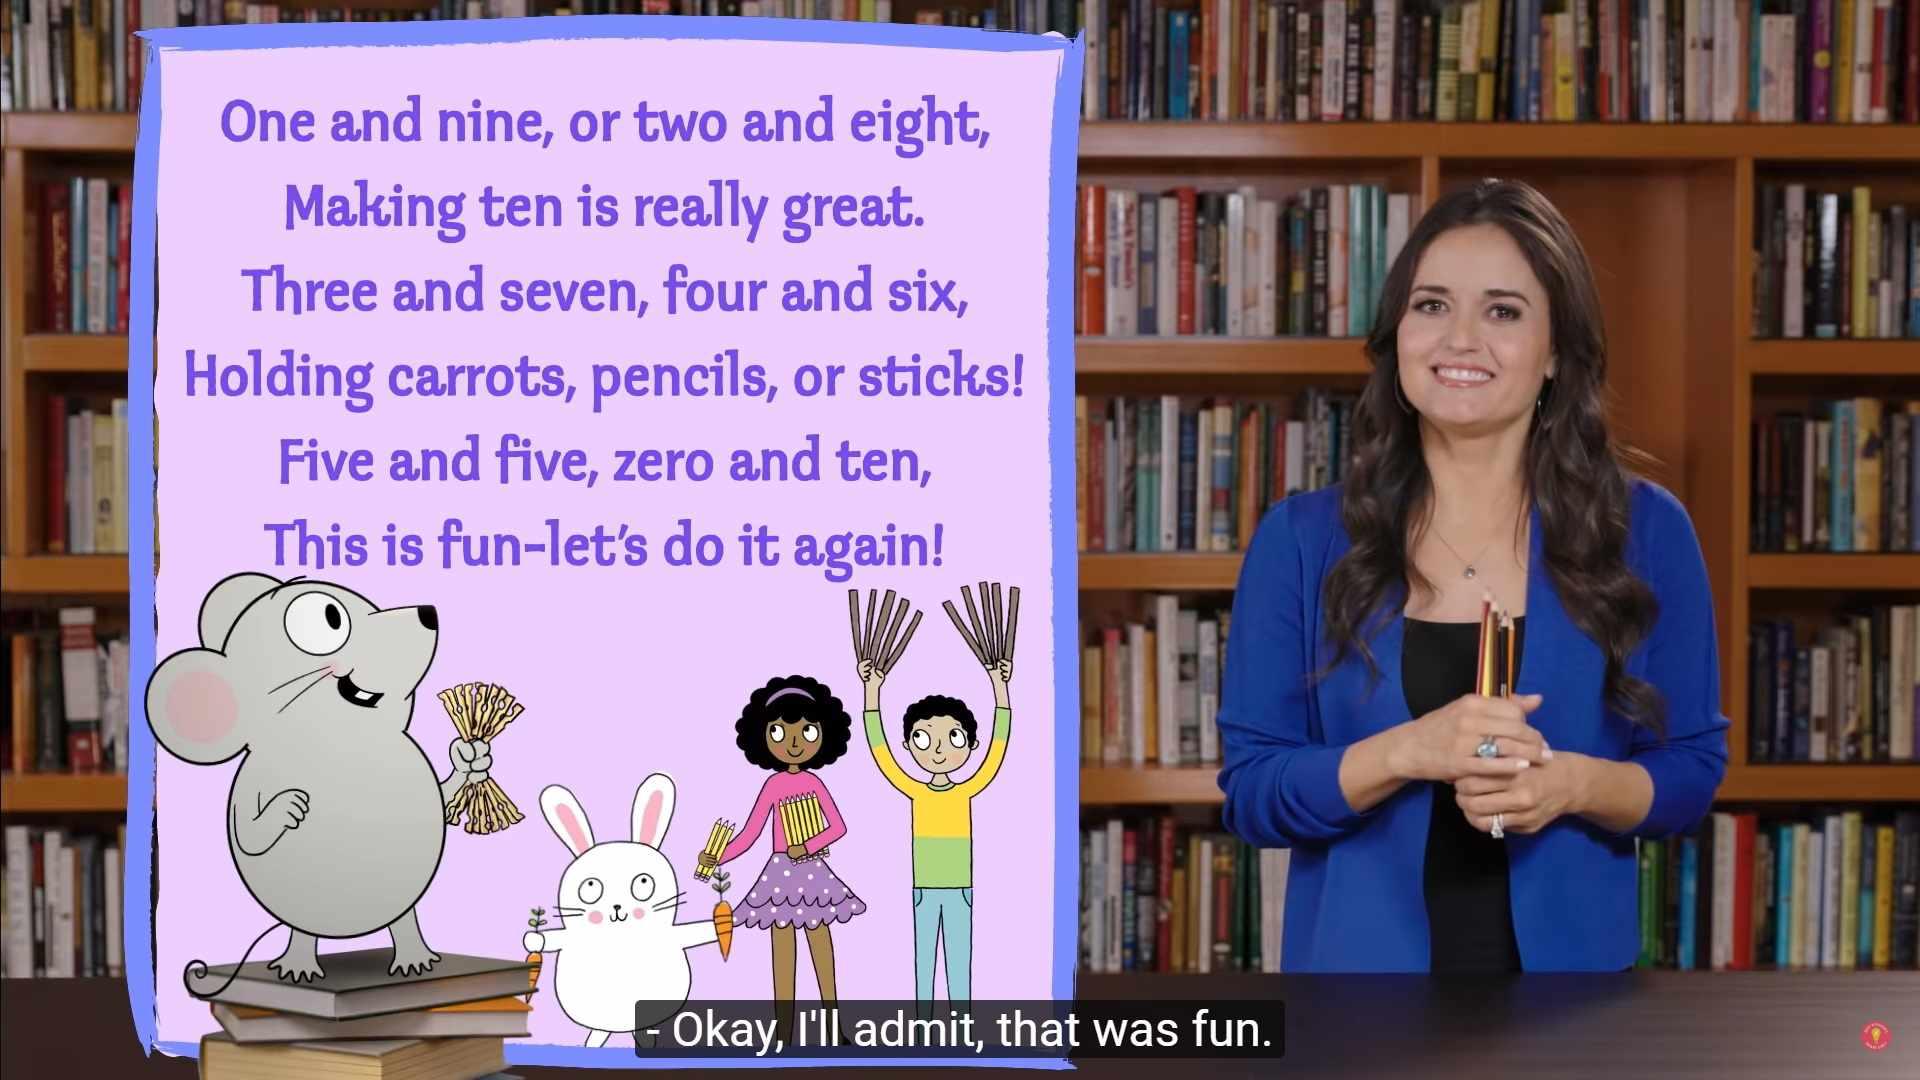 Danica McKellar is holding pencils demonstrating ways to make 10